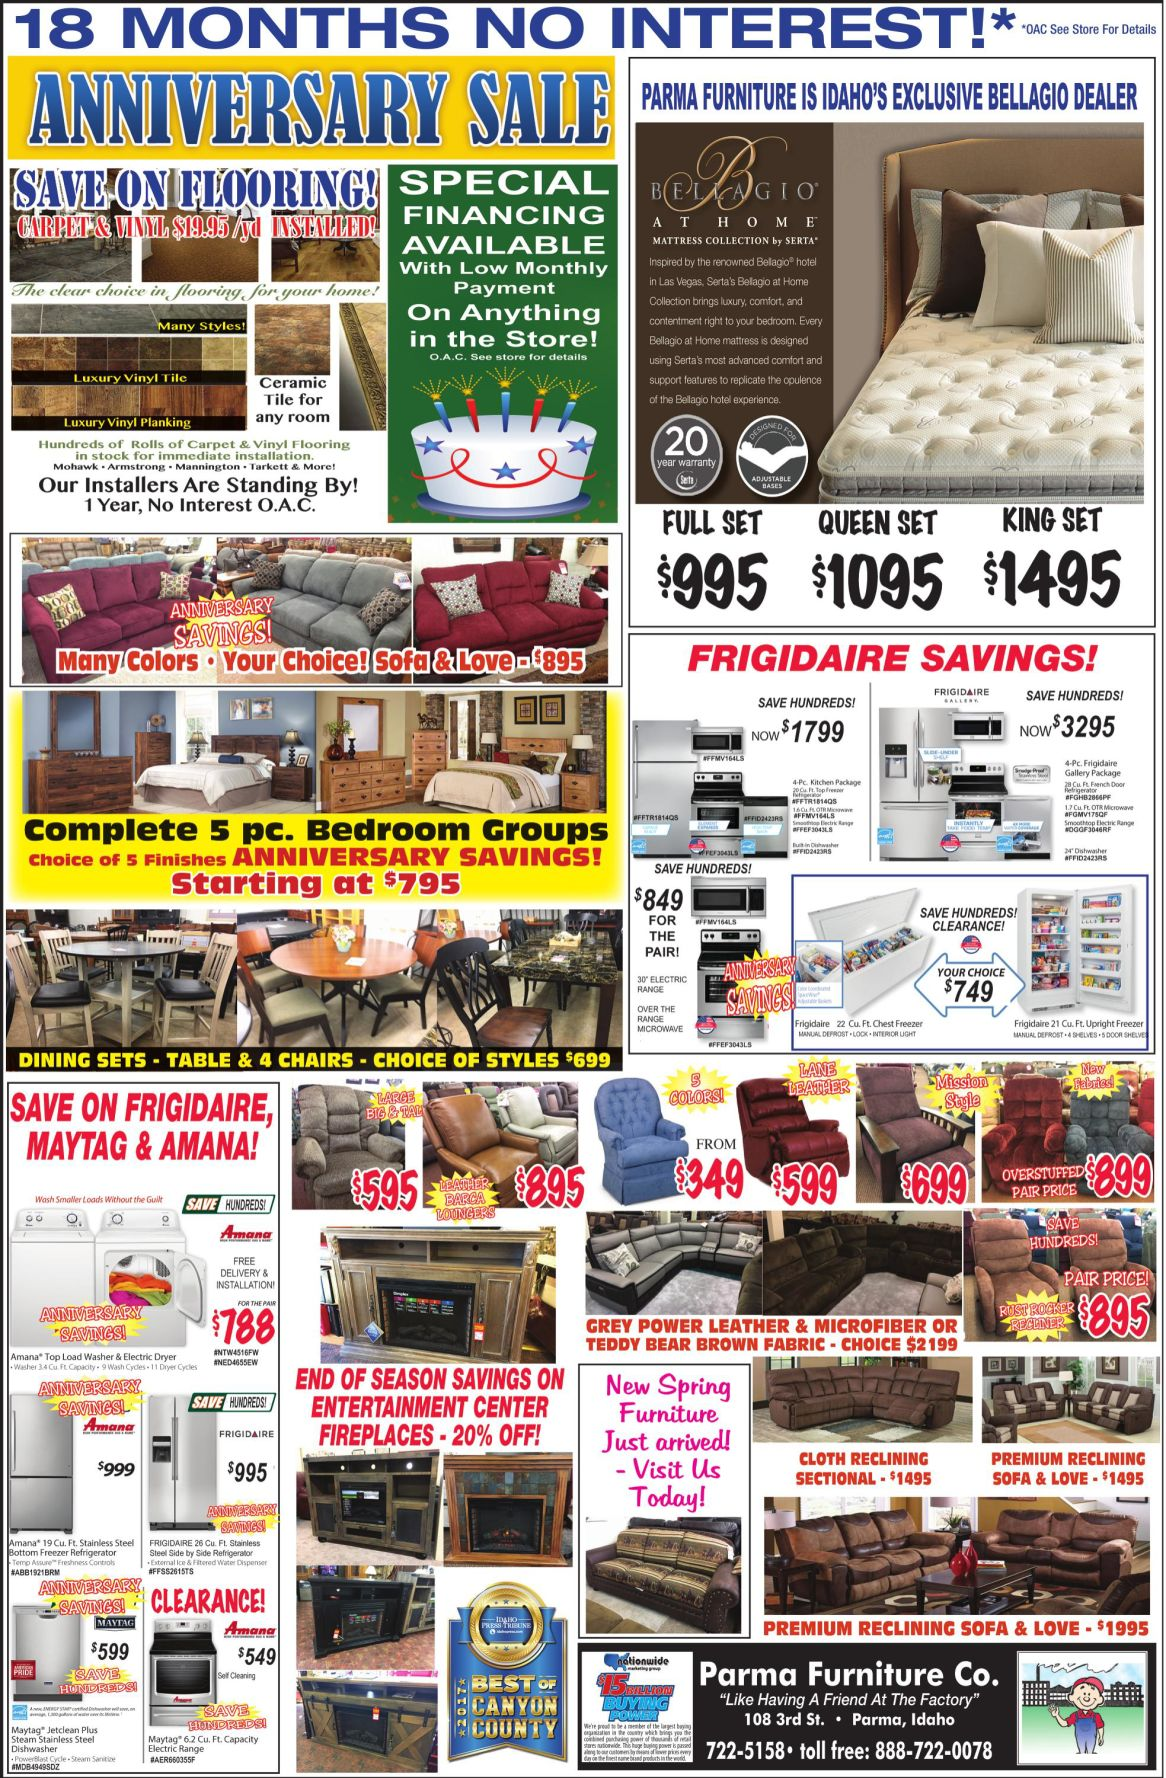 Parma Furniture Co Services